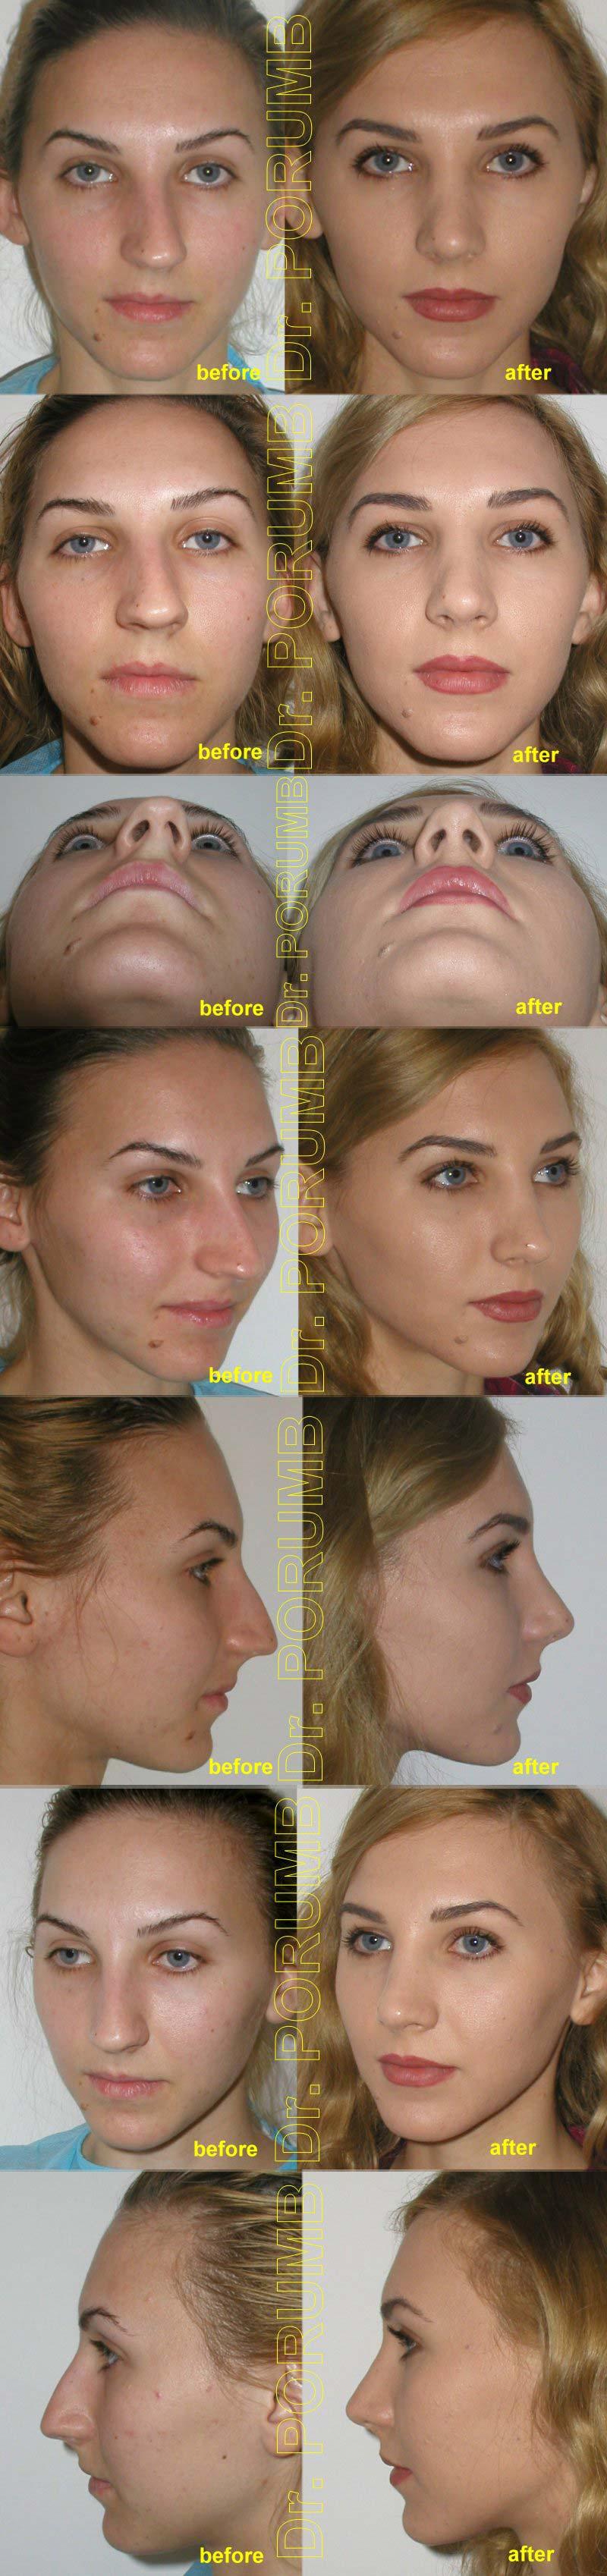 Pacienta de 24 ani, nemultumita de deviatia majora a nasului, de deviatia de sep